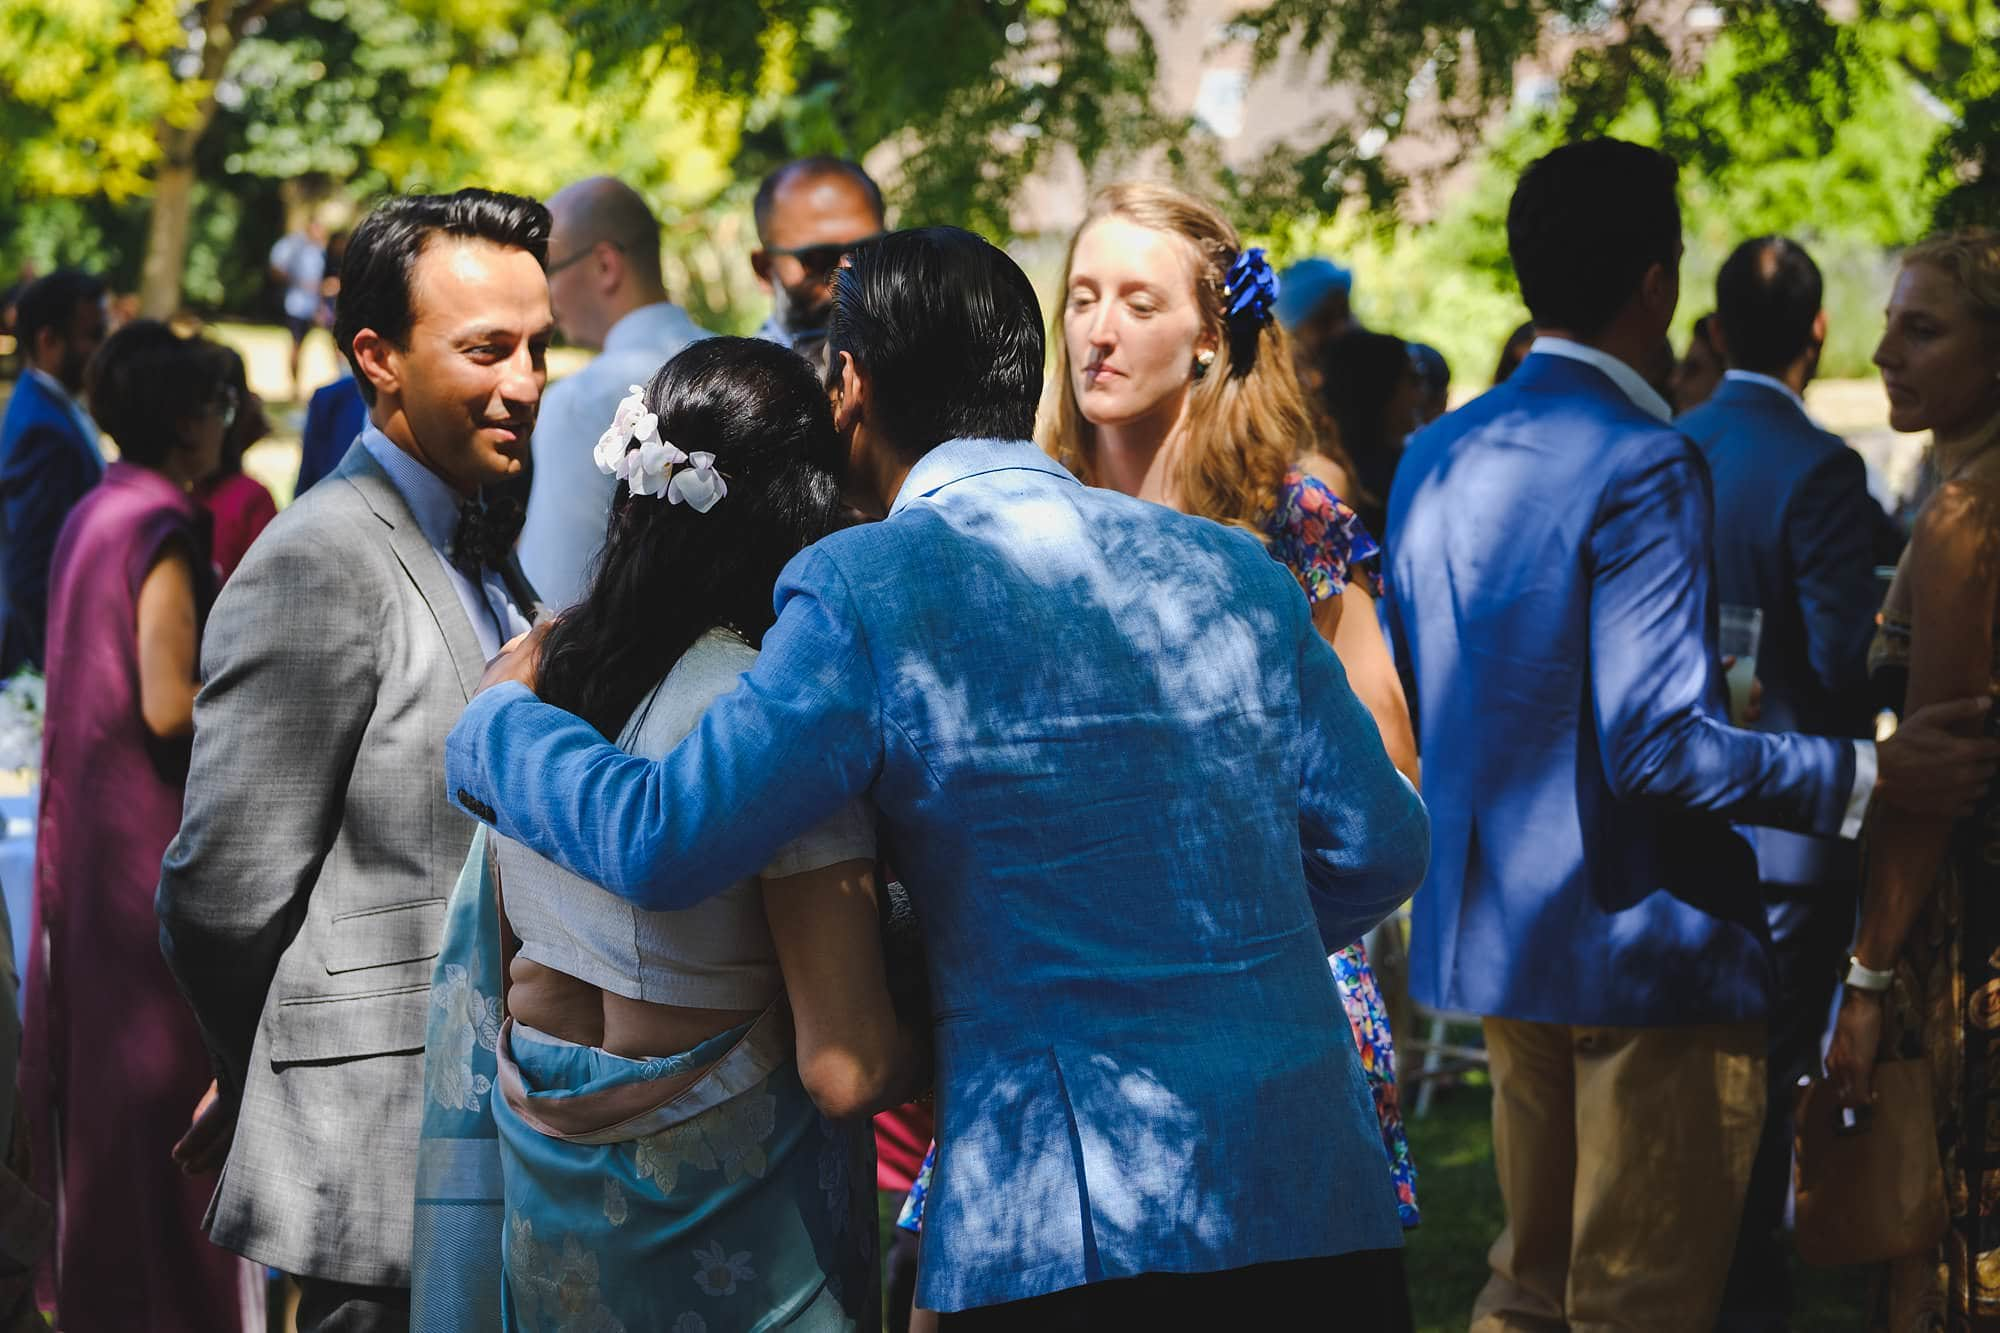 orangery holland park wedding reception 007 - Holland Park Orangery Wedding Photographer | Ayesha & Ritam